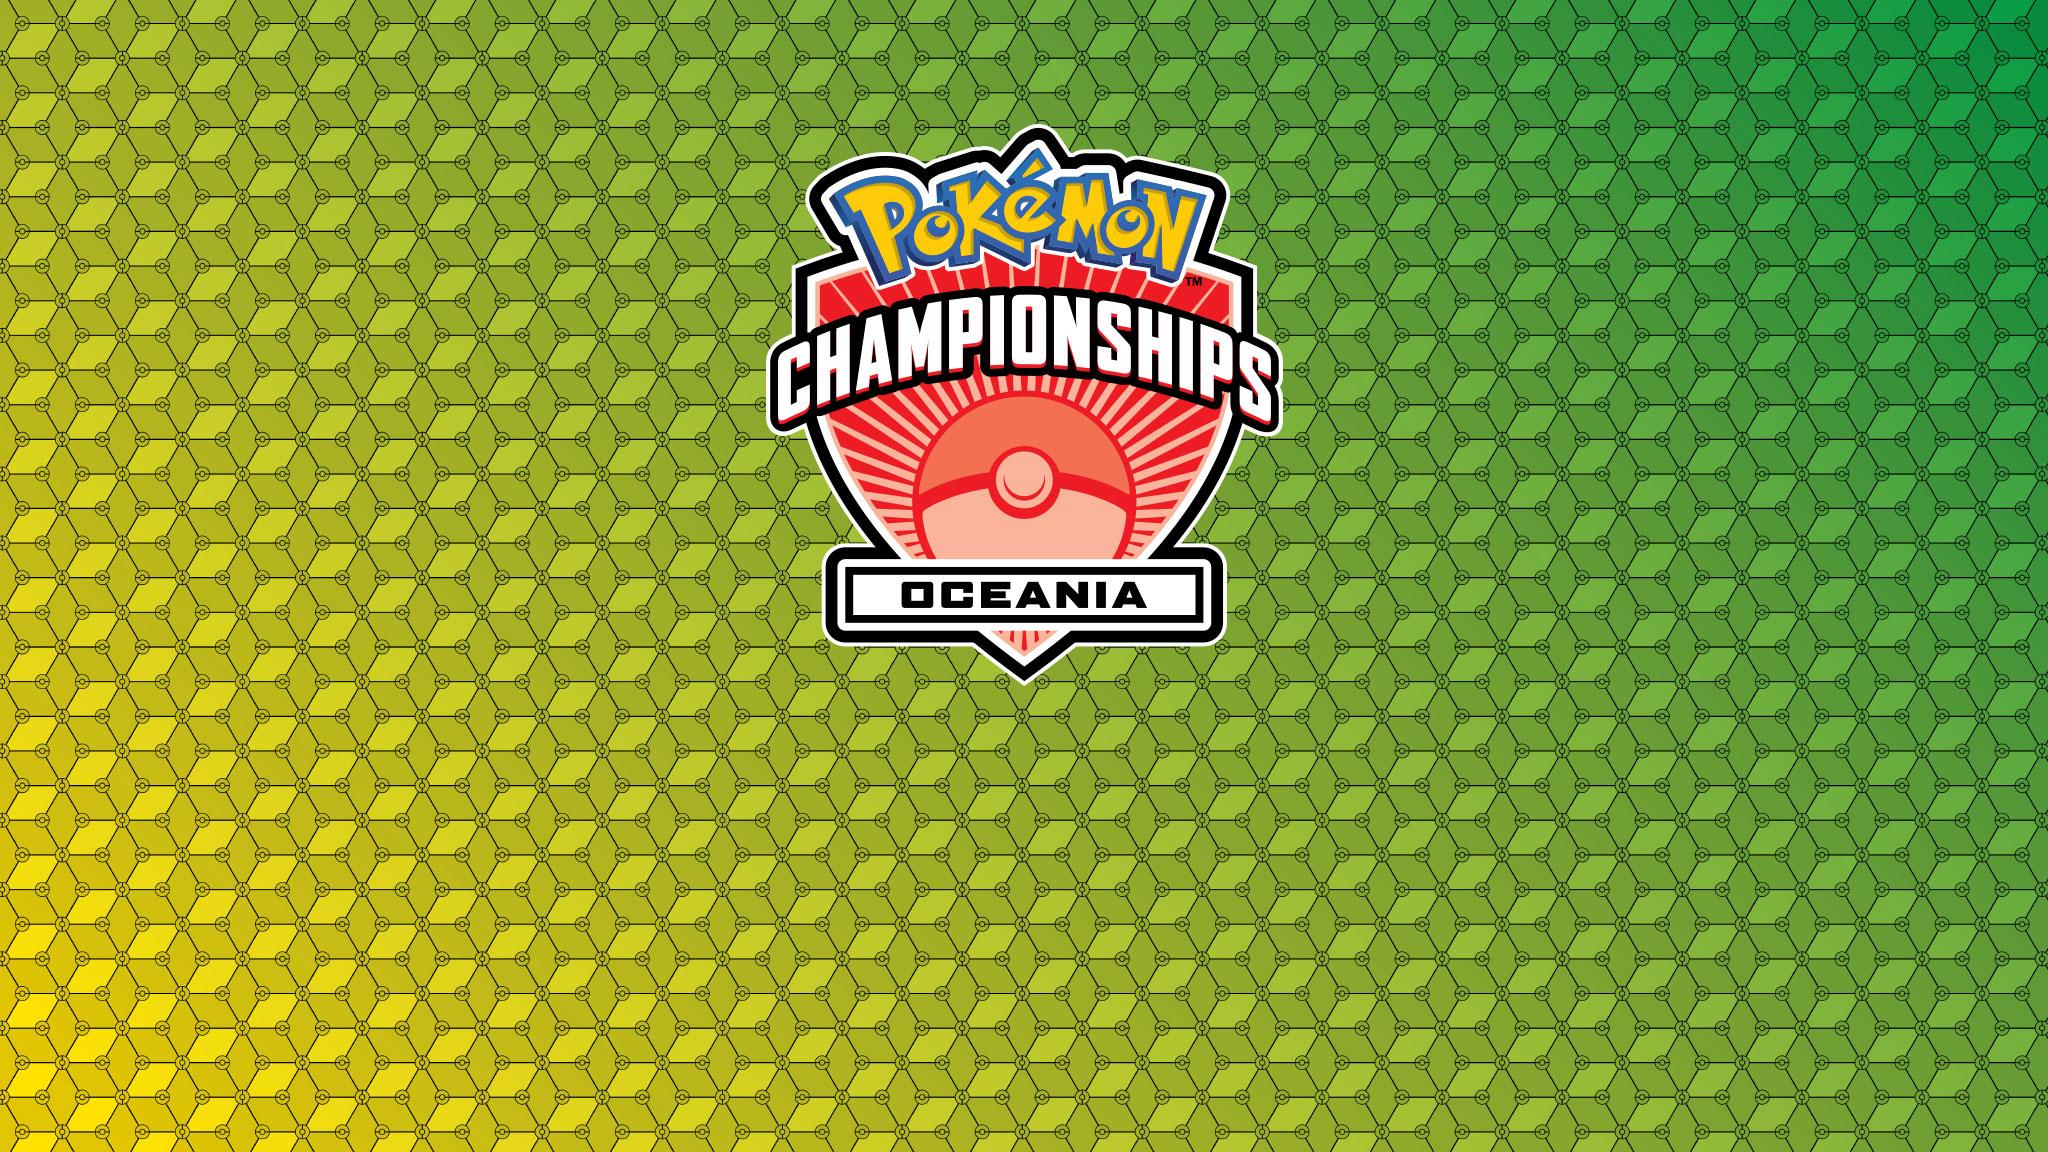 2019 Pokémon Oceania International Championships on FREECABLE TV